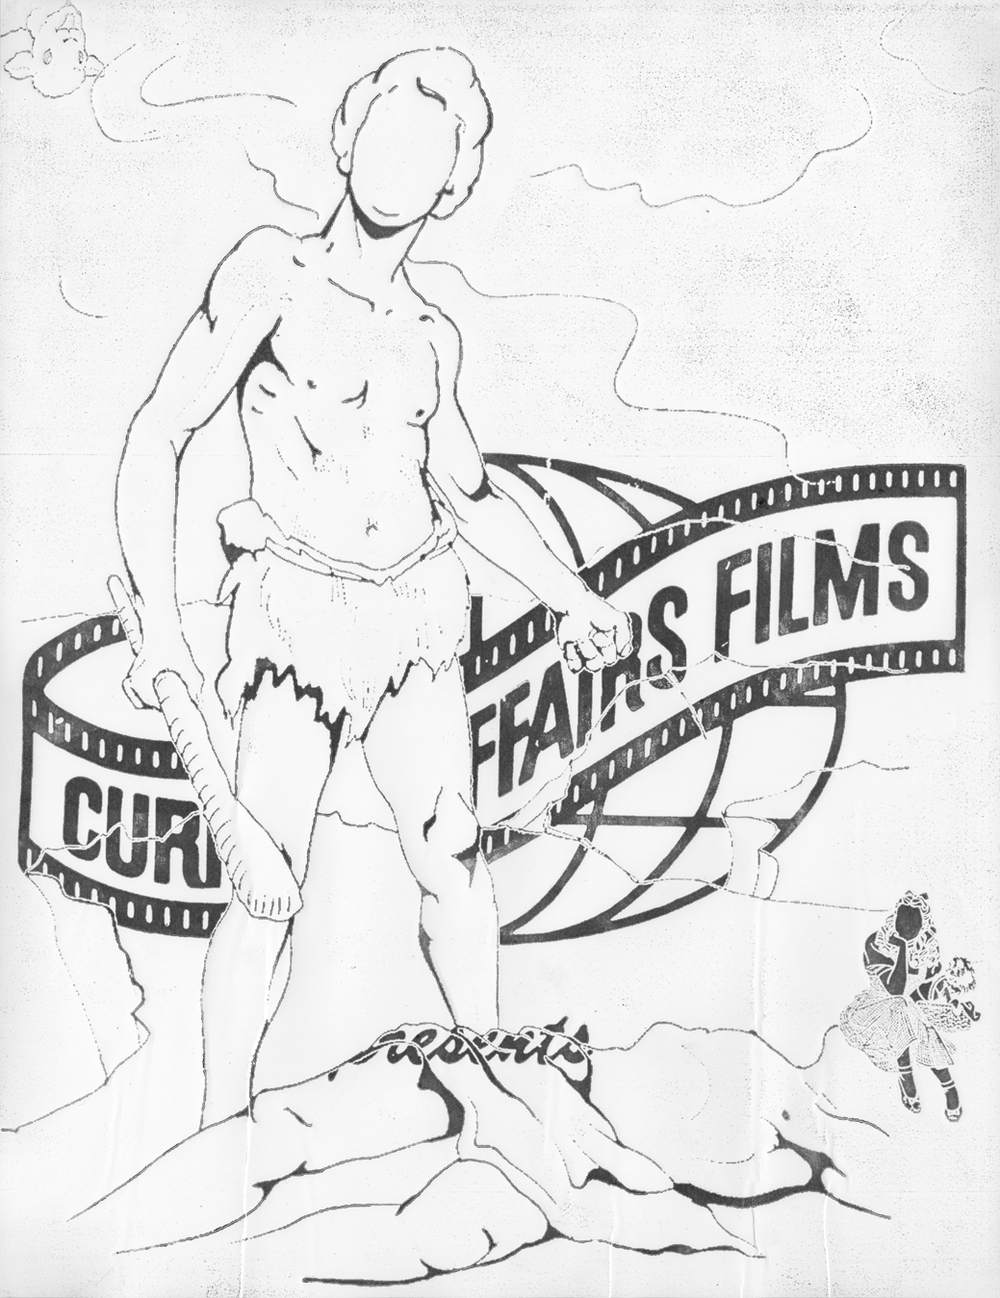 Current Affairs films presents - Film Poster ART #1